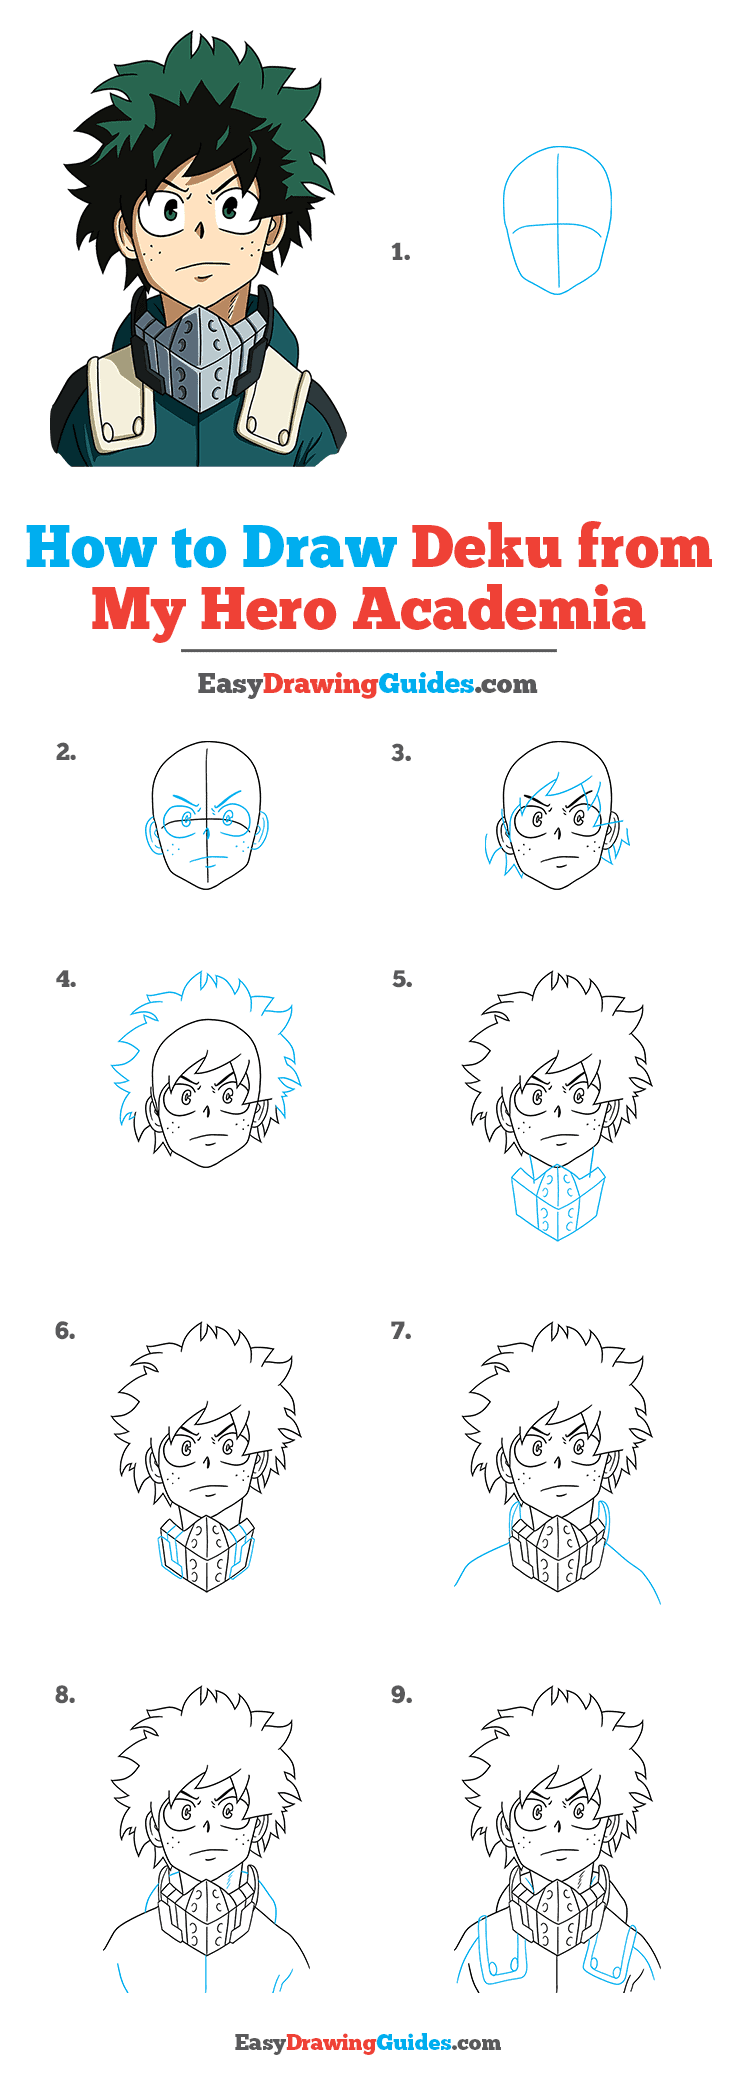 How to Draw Deku from My Hero Academia Step by Step Tutorial Image